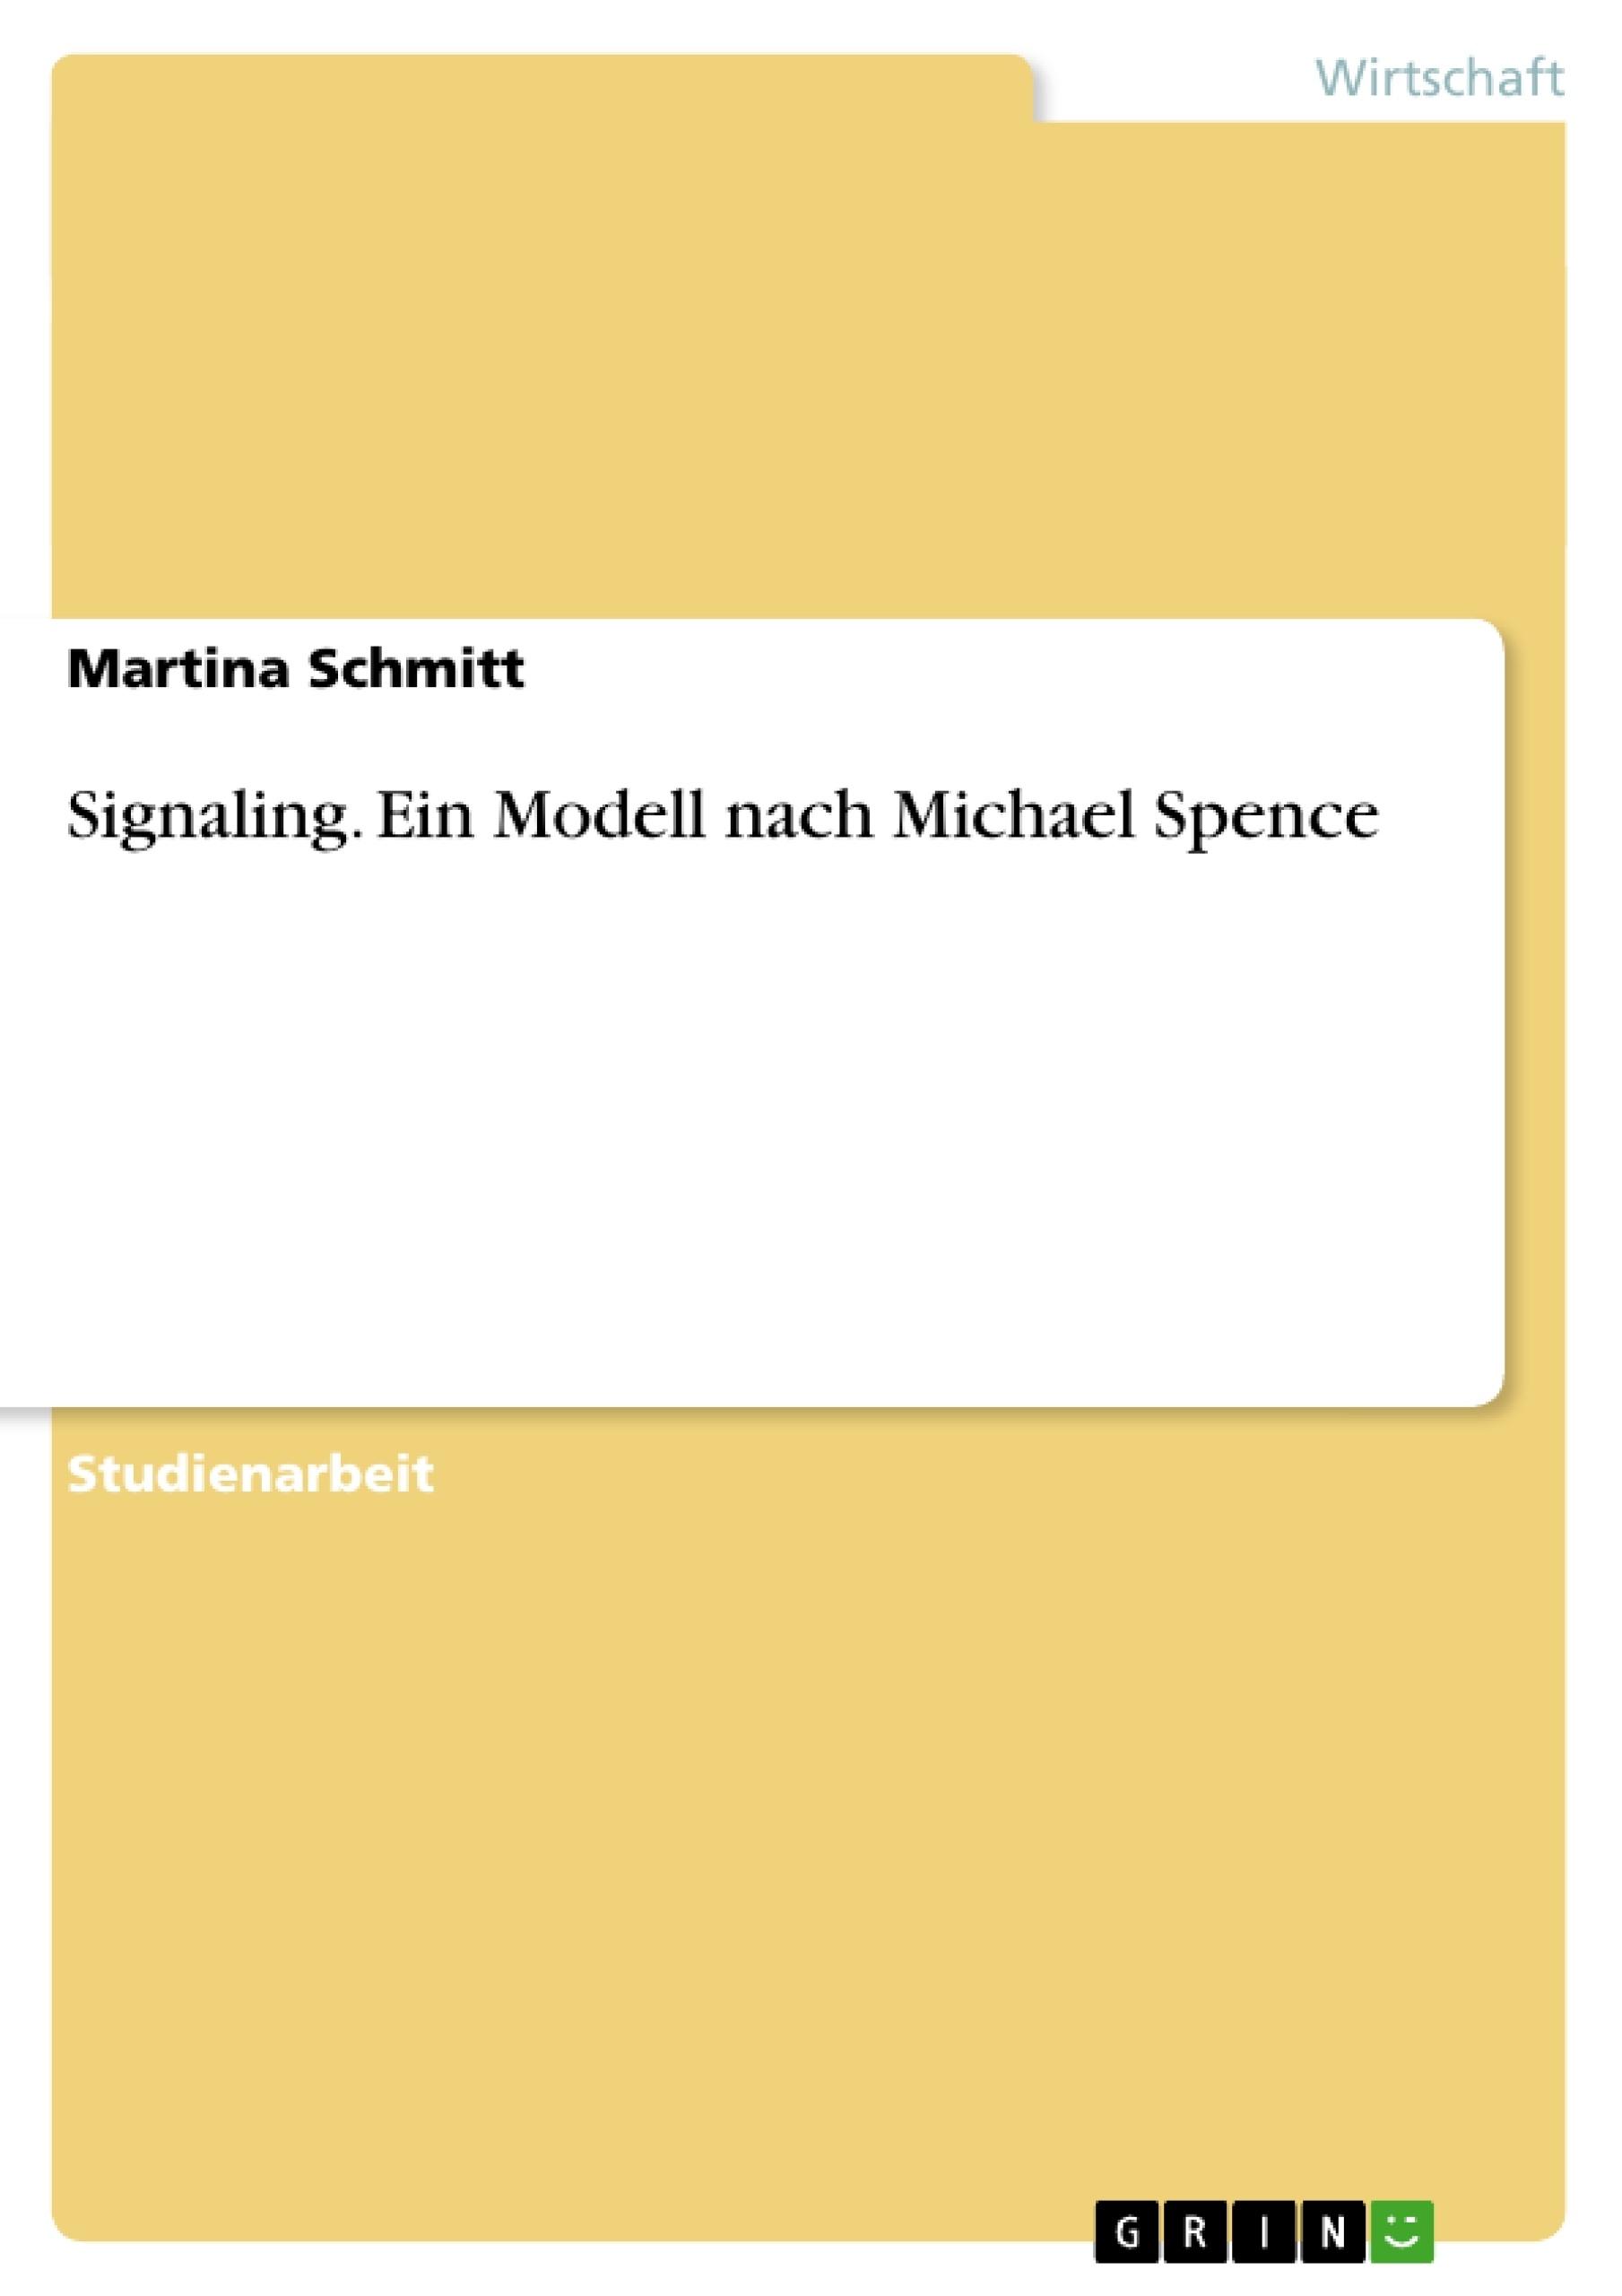 Titel: Signaling. Ein Modell nach Michael Spence